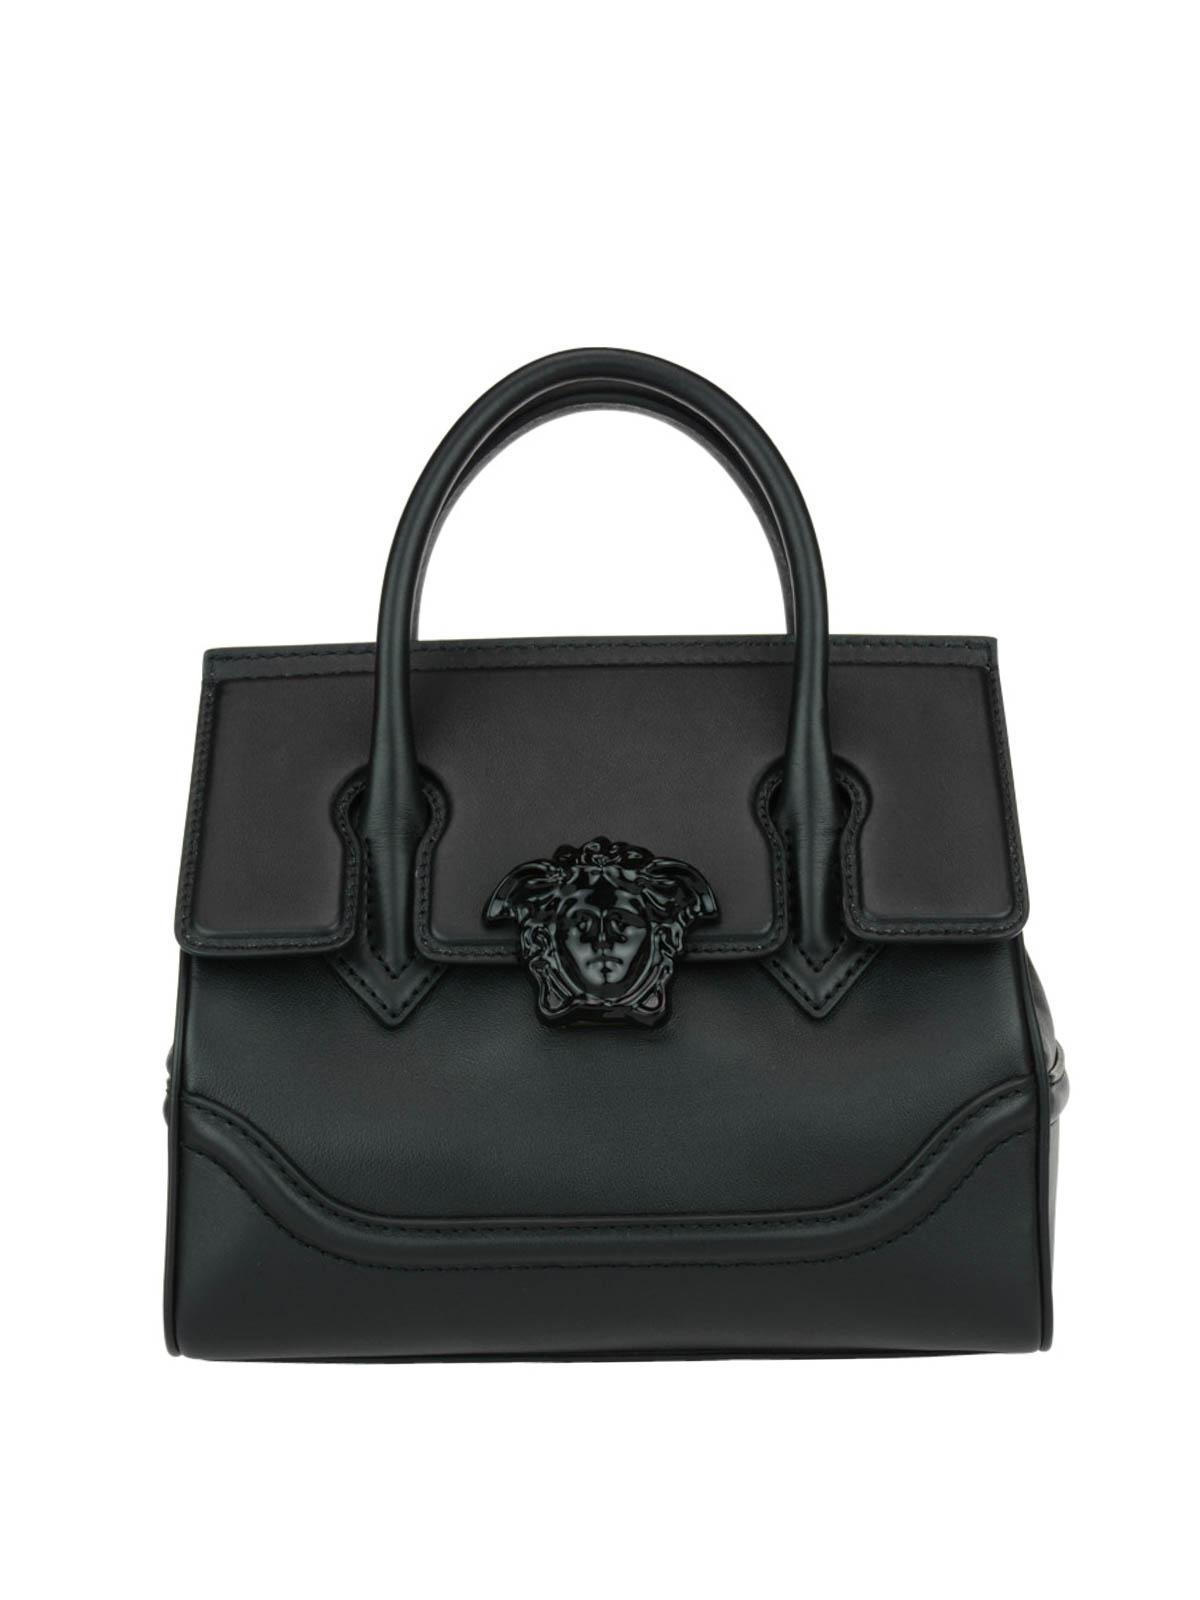 Versace Palazzo Empire Black Bag Bowling Bags